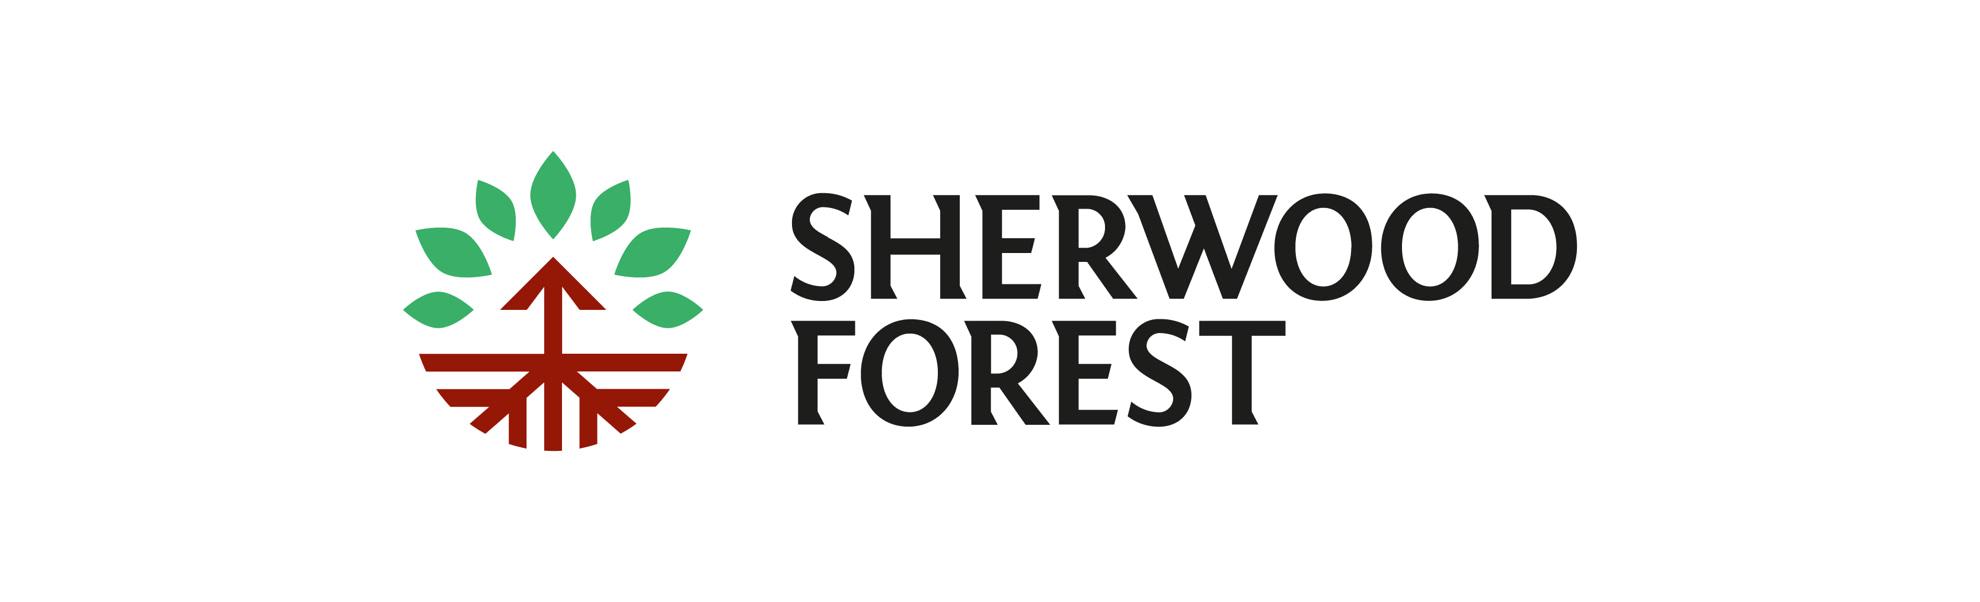 las sherwood ma logo